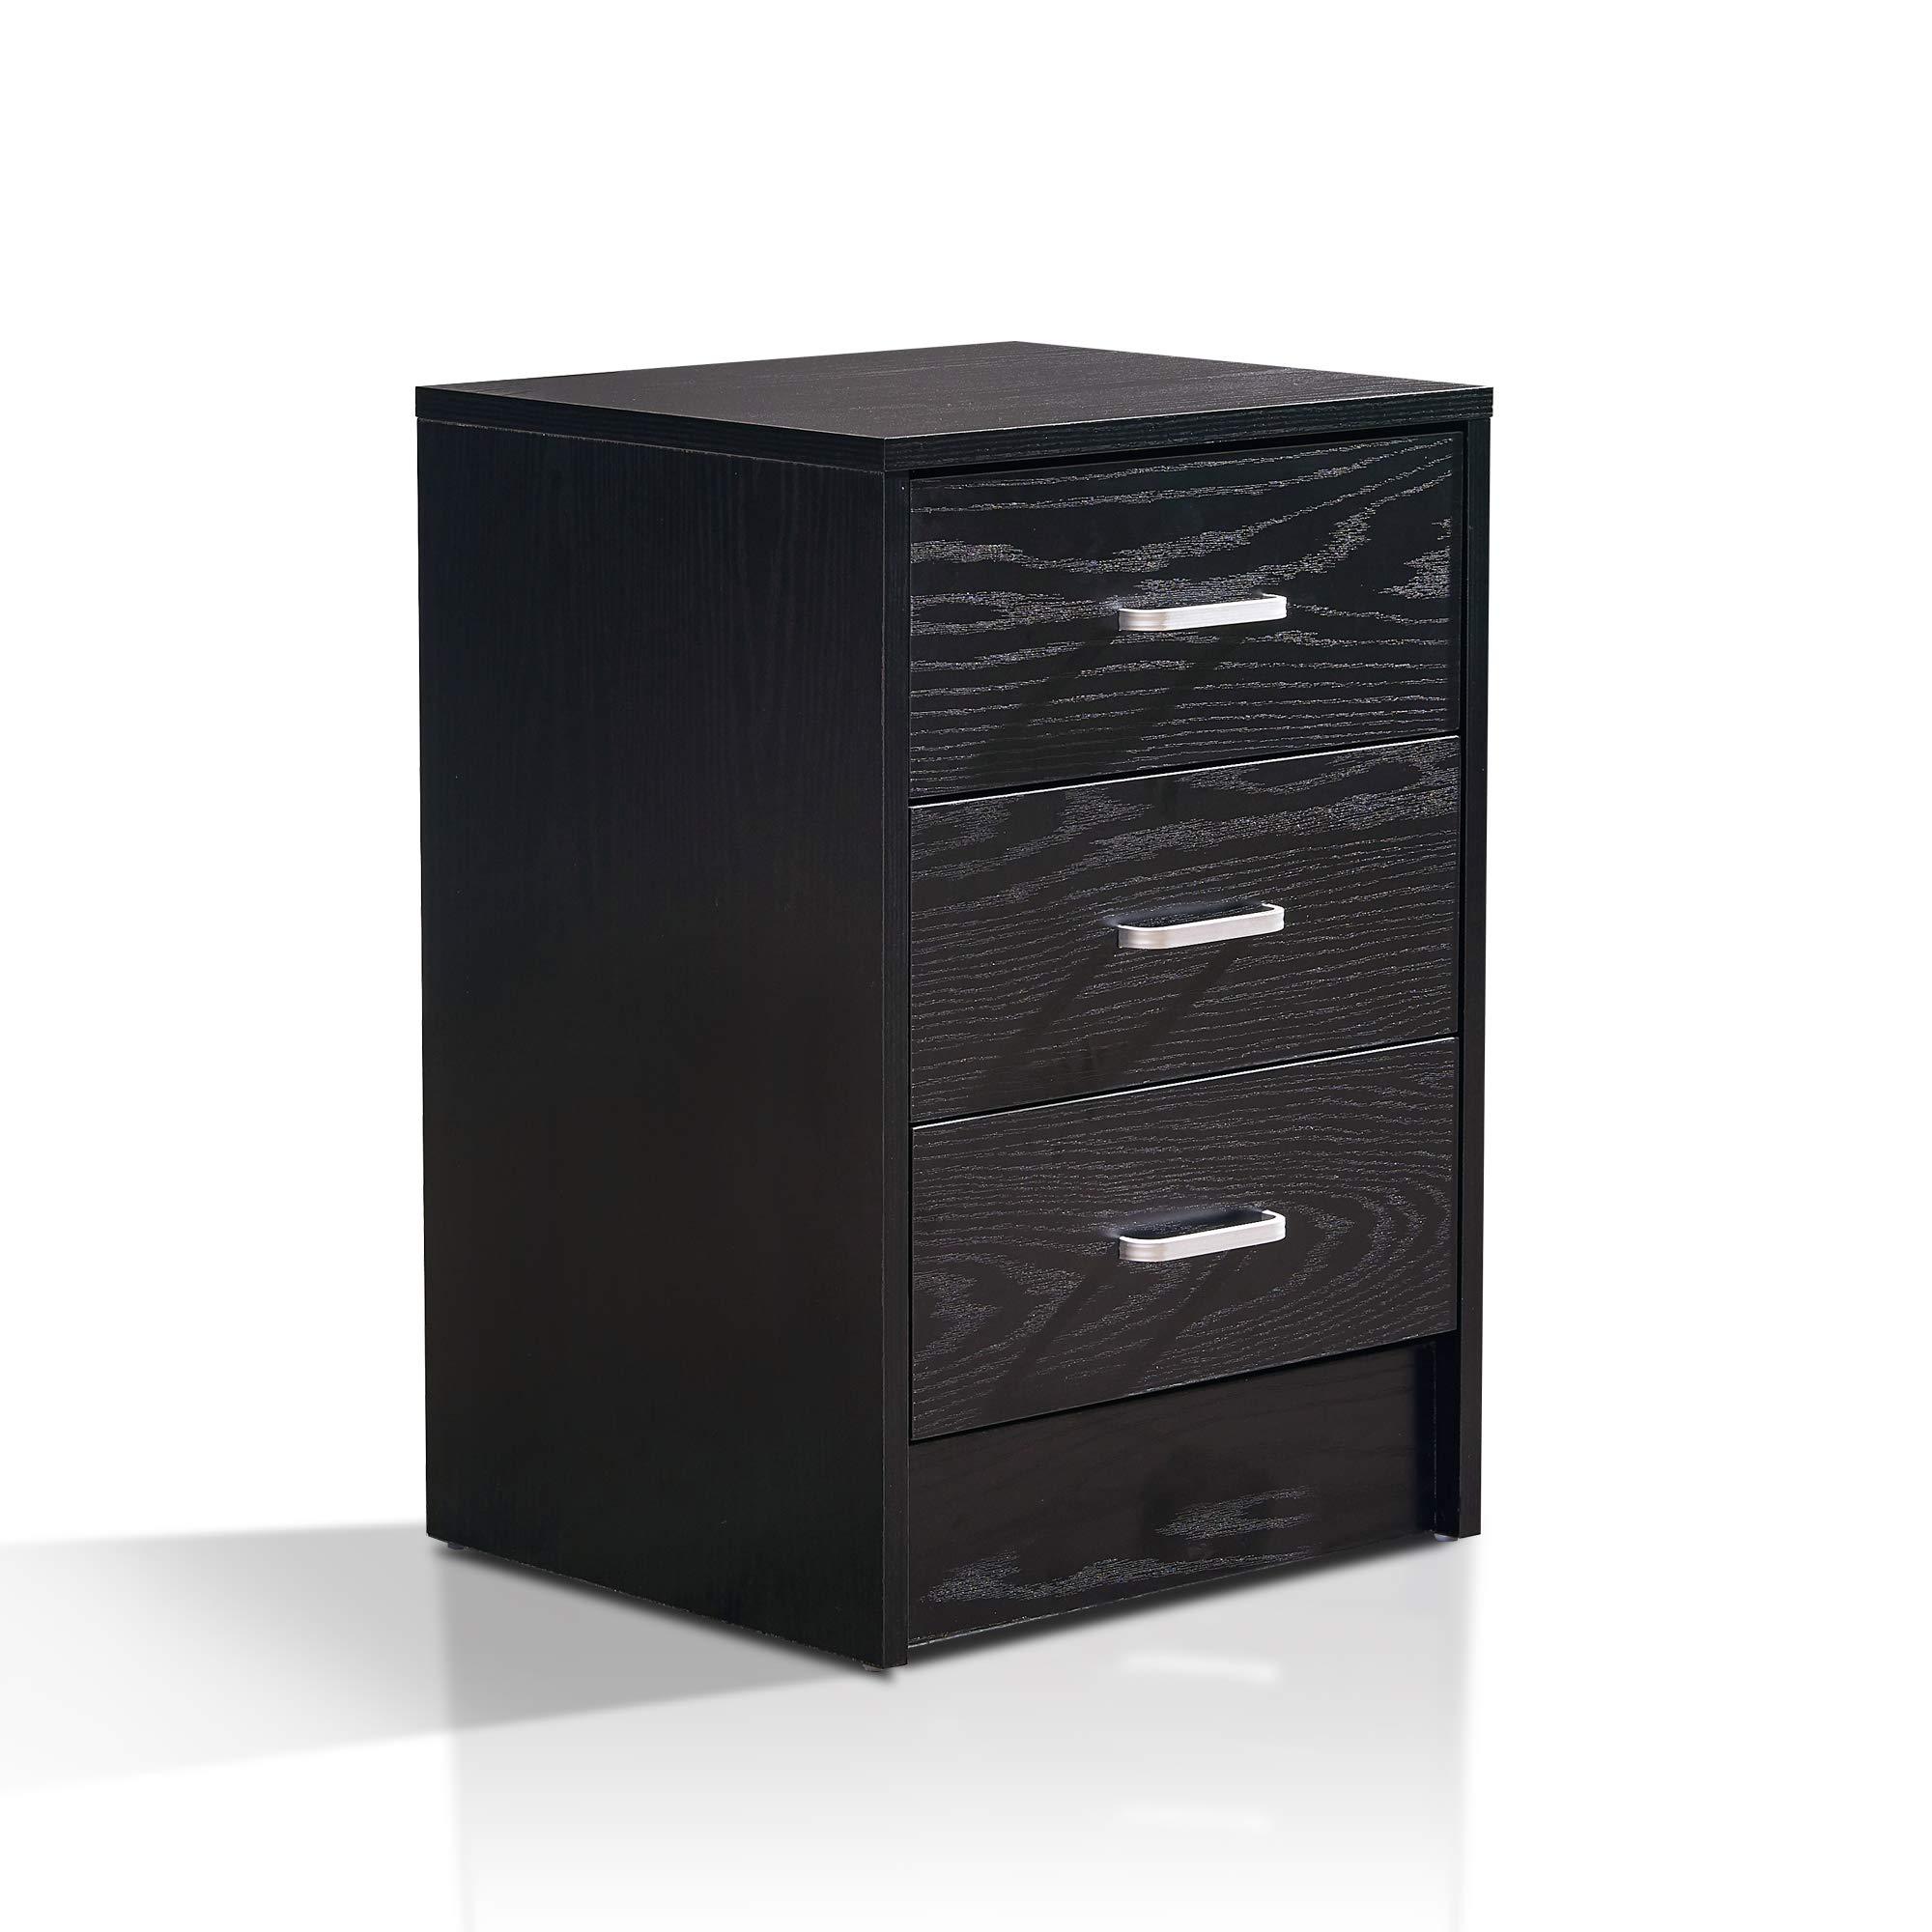 3 Drawer Filing Cabinet Vertical Filing Cabinets Lateral Filing Cabinet 9901 (Black)